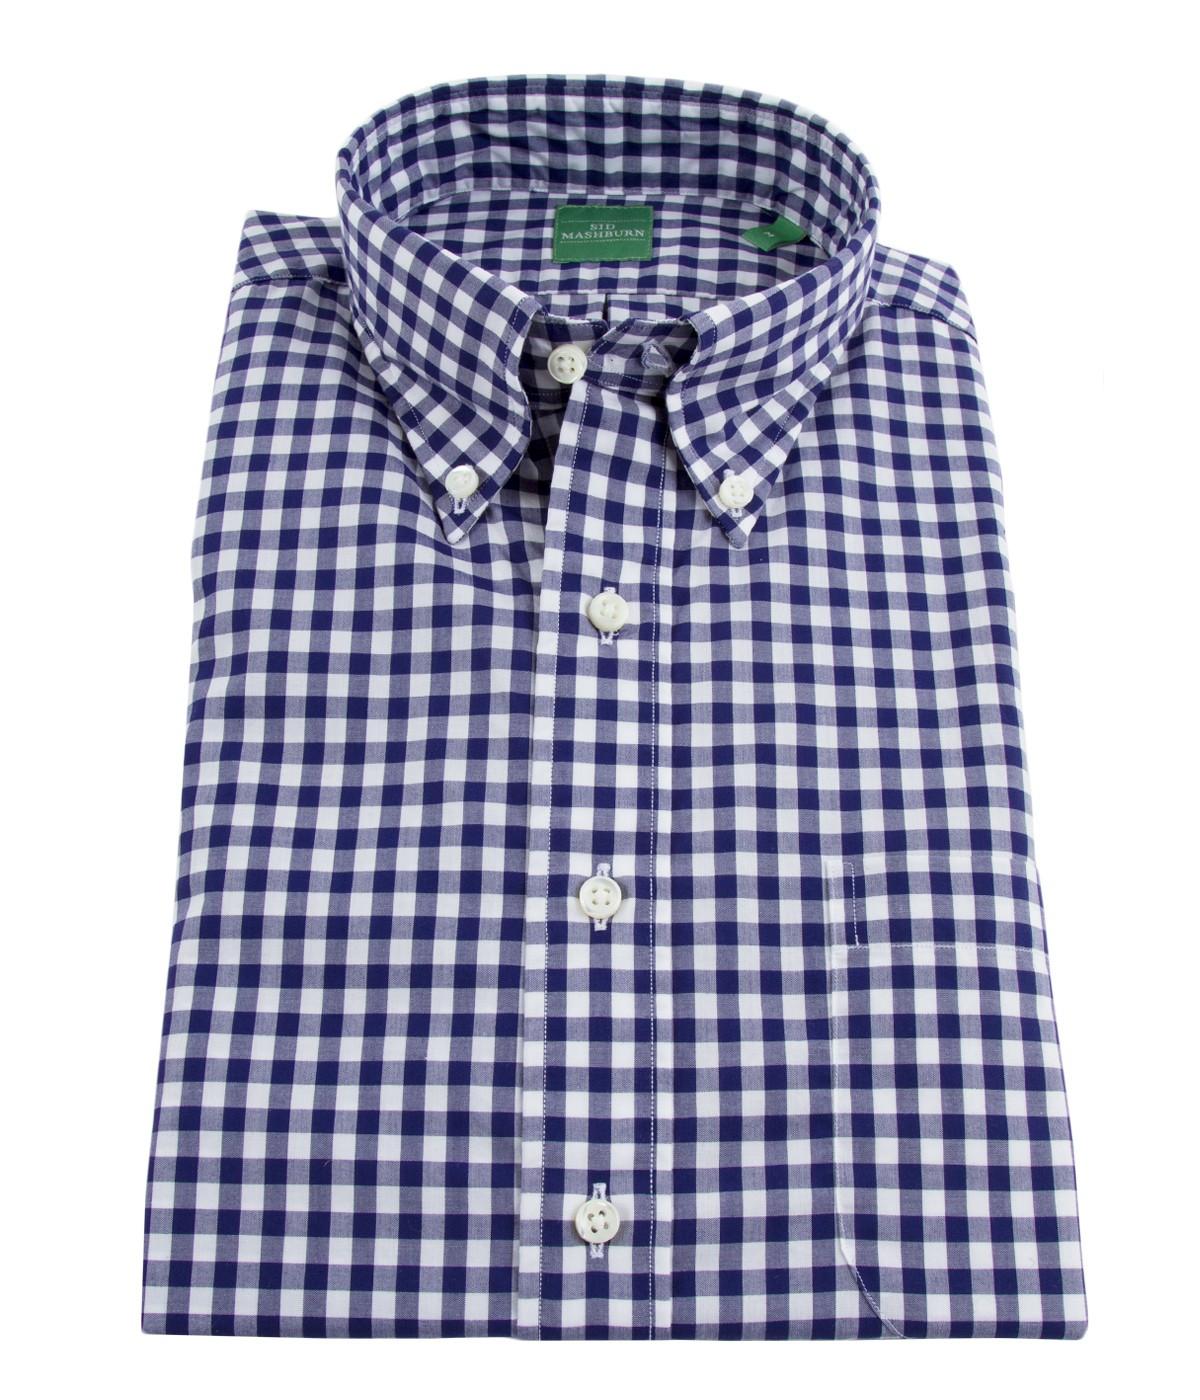 Mashburn blue gingham button down collar post modern for Blue gingham button down shirt